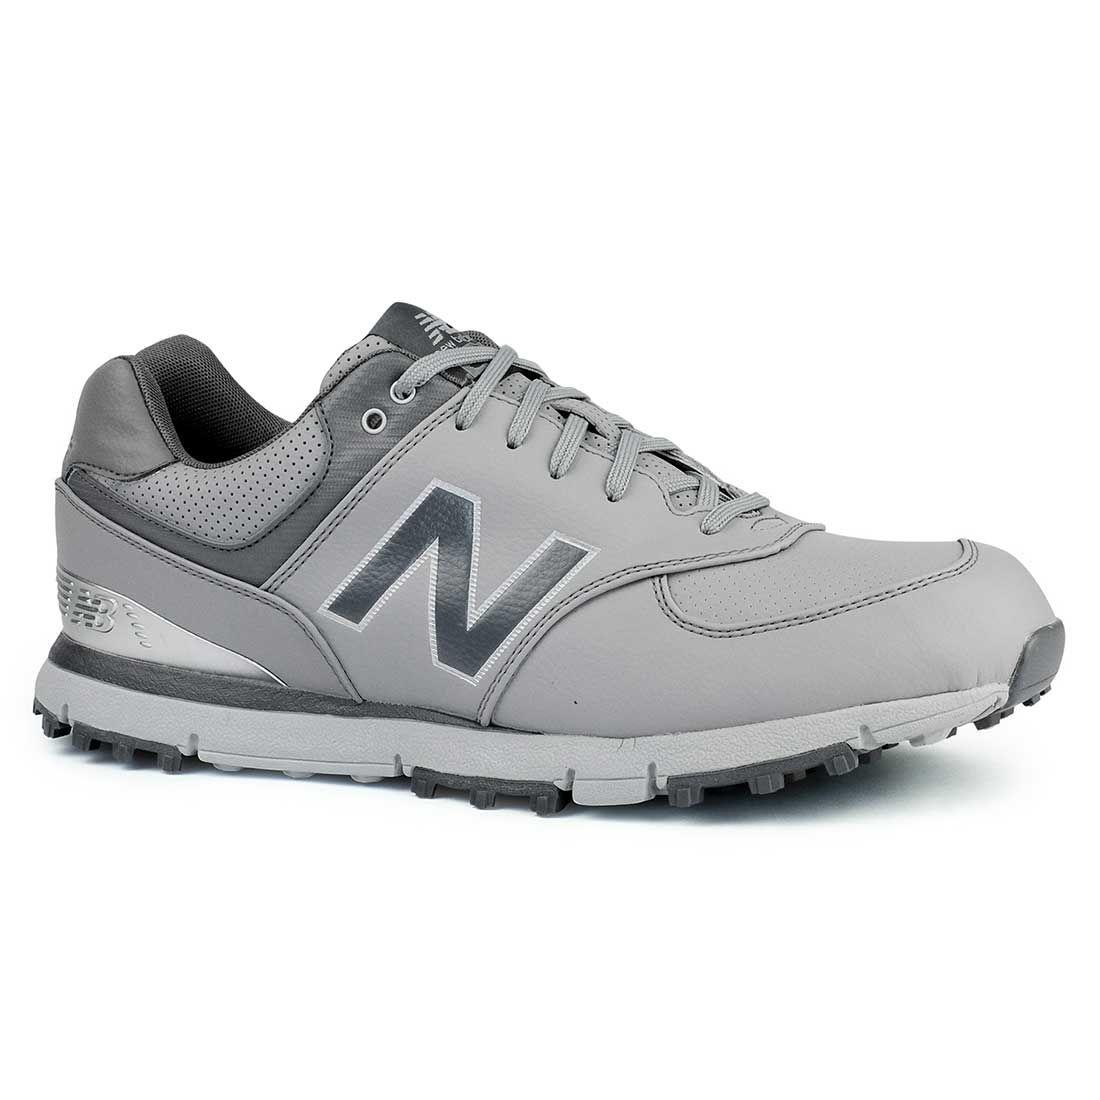 Buy New Balance NBG574 SL Golf Shoes